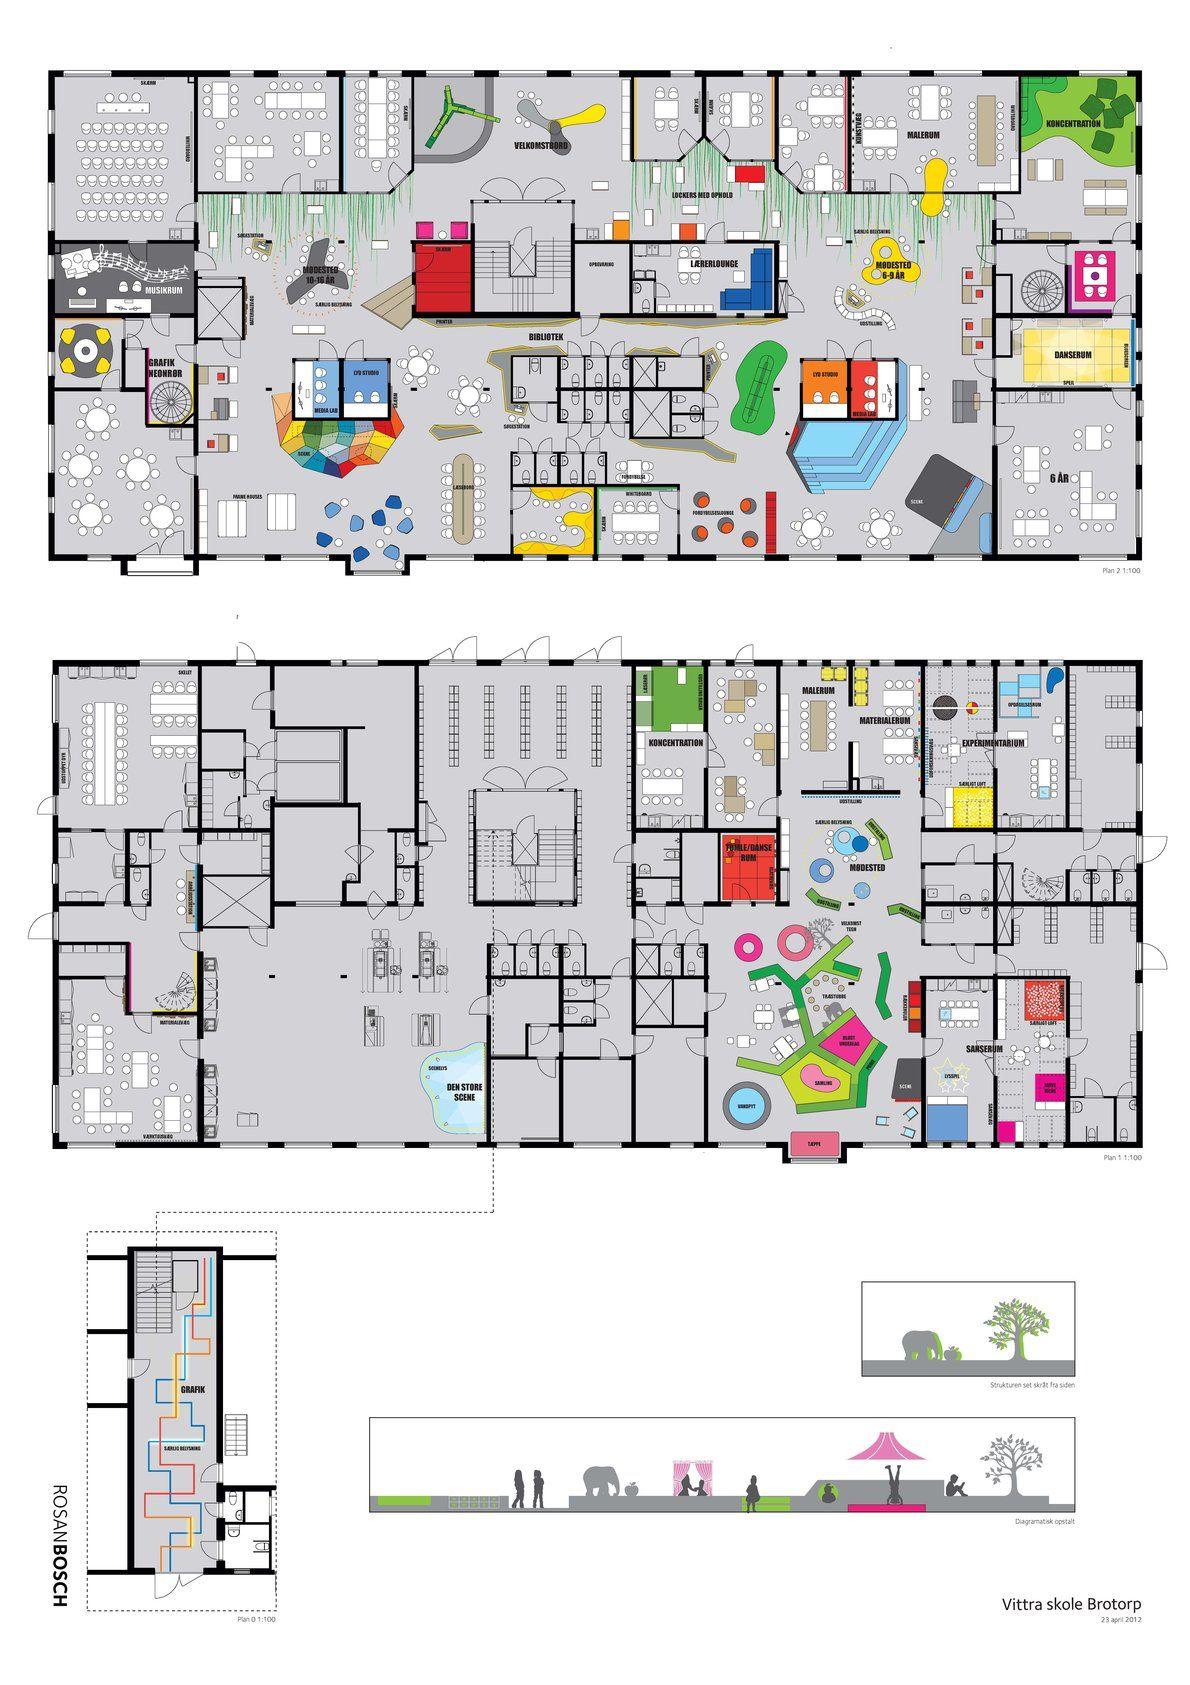 Architecture School Plan elementary school building design plans |  architecture